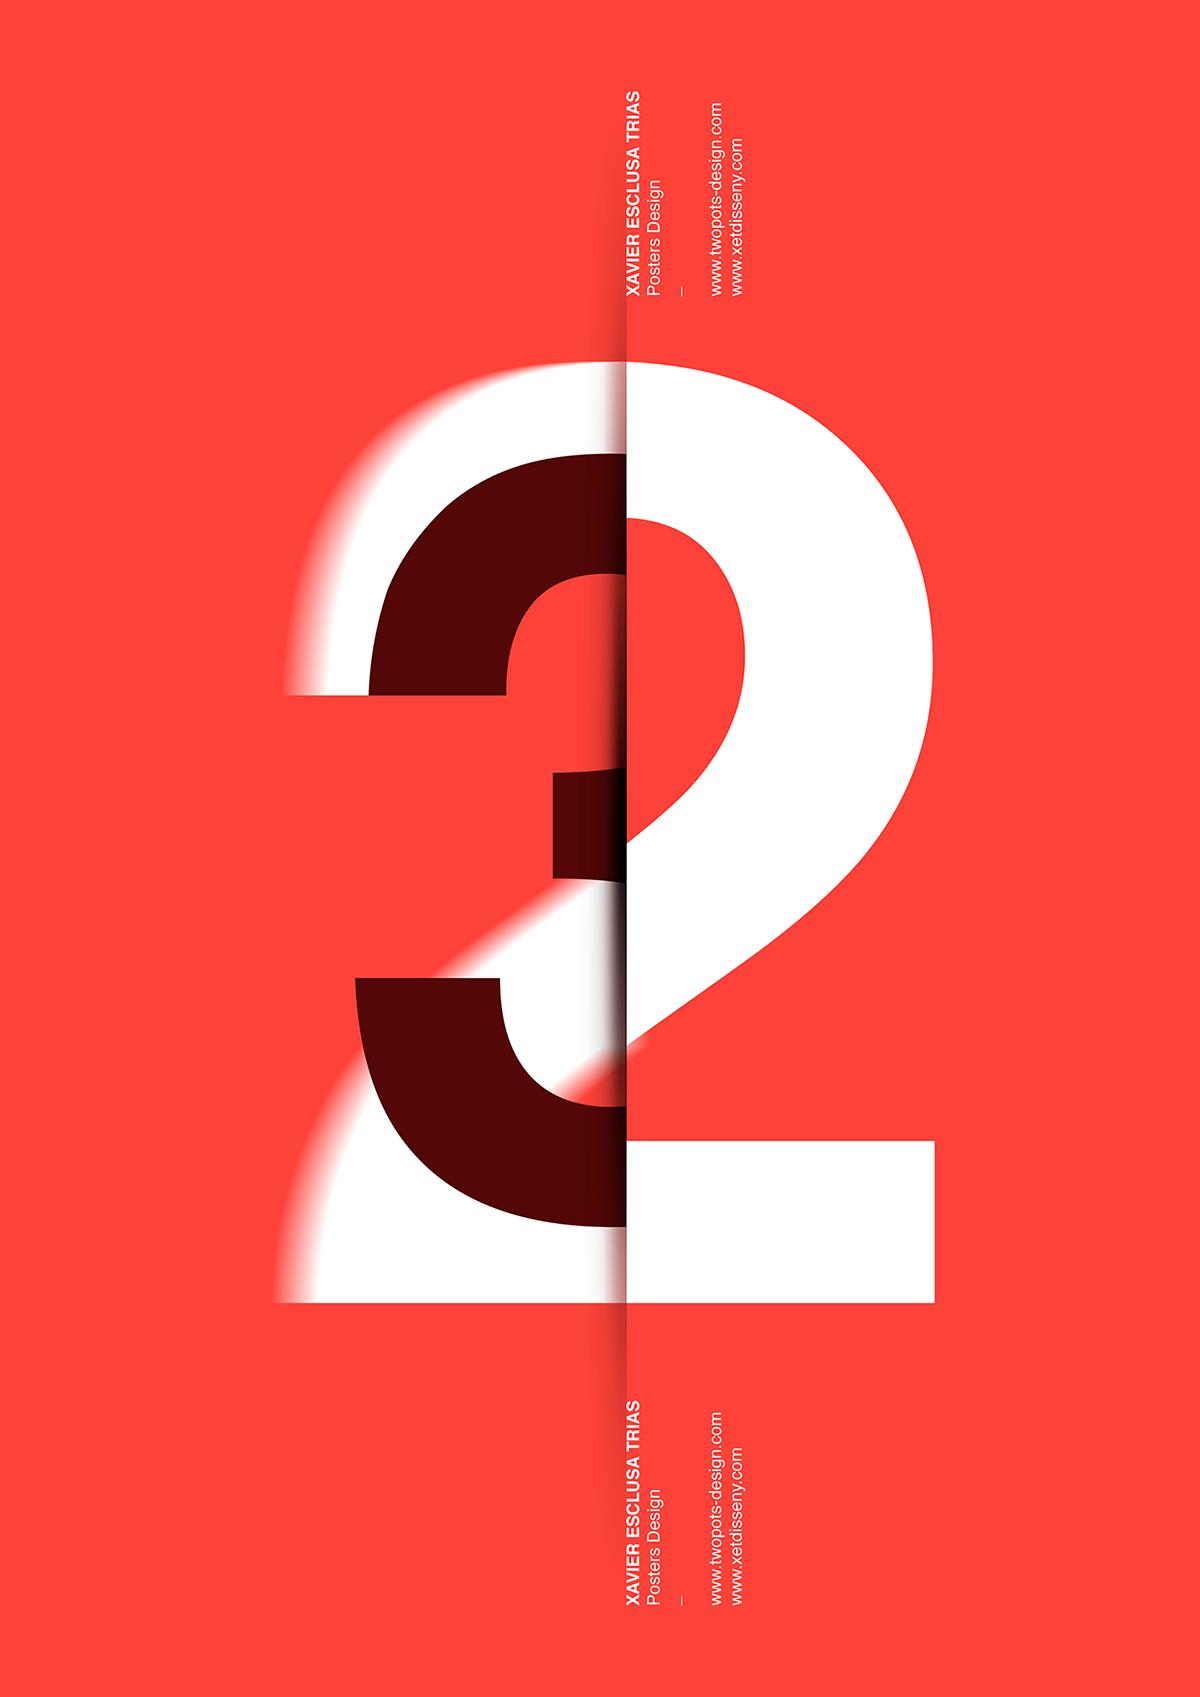 Minimalist Poster Design - Mindsparkle Mag